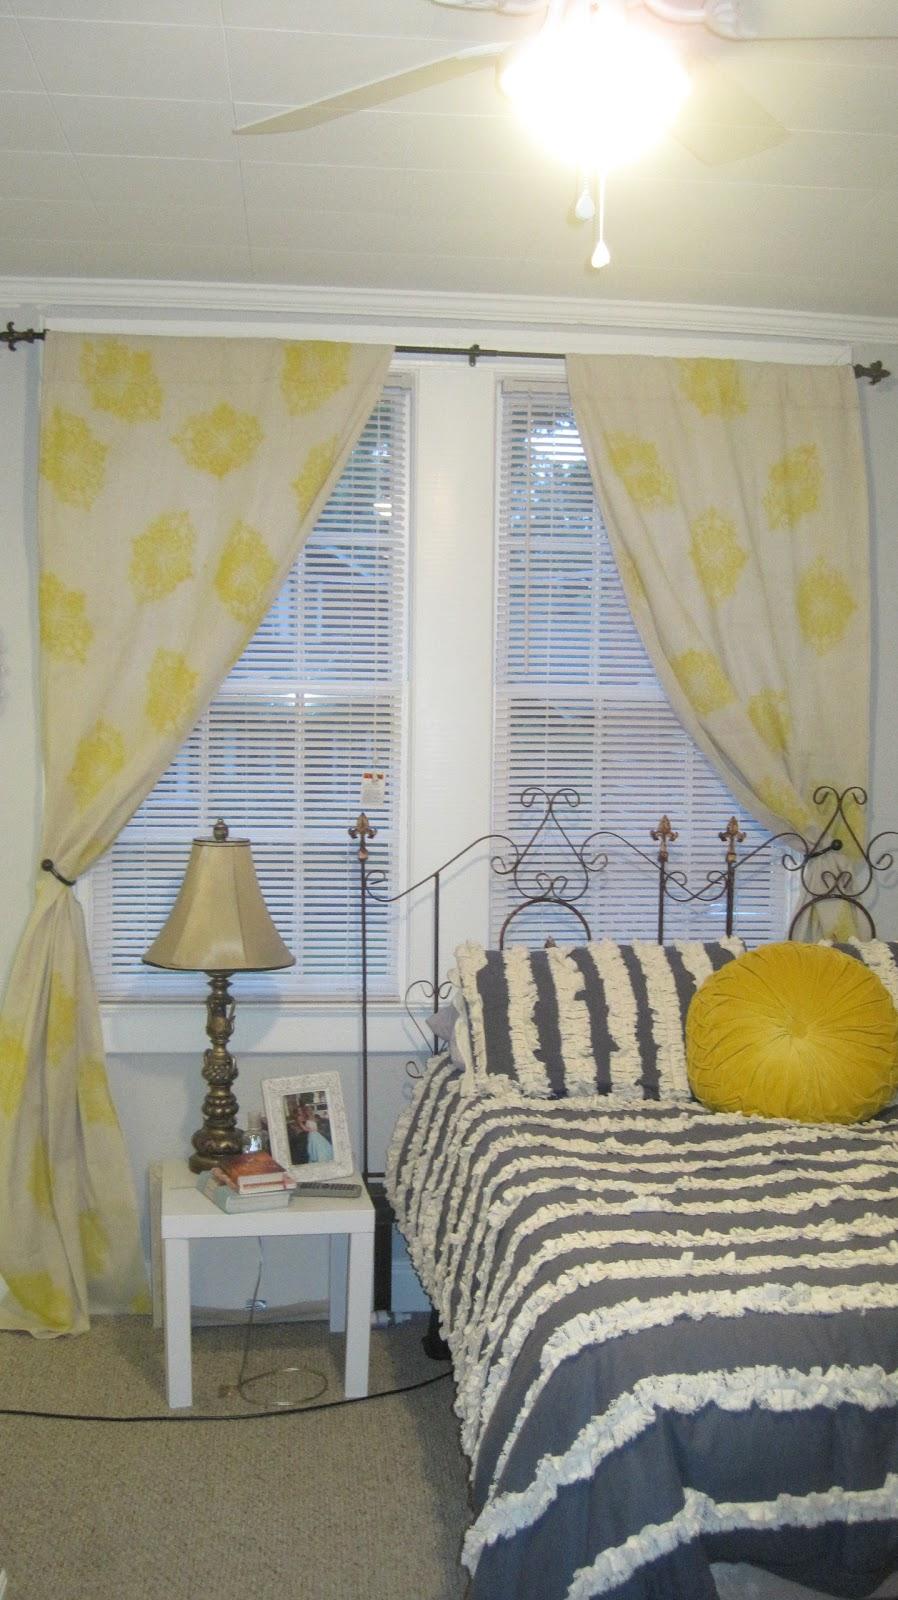 Paint Drop Cloth Curtains Nickles Dimes Spray Paint Drop Cloth Curtains